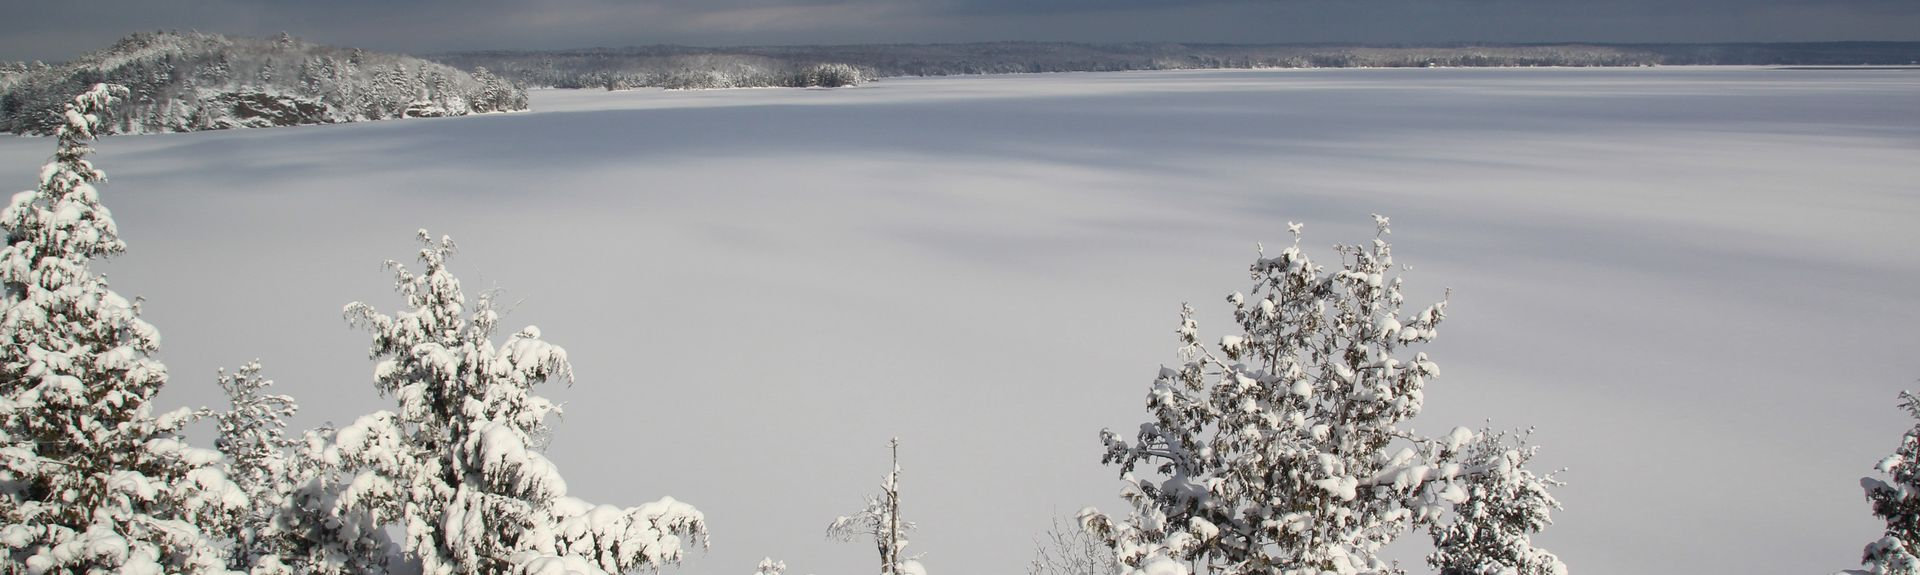 Hidden Valley Highlands (χιονοδρομικό κέντρο), Huntsville, Οντάριο, Καναδάς